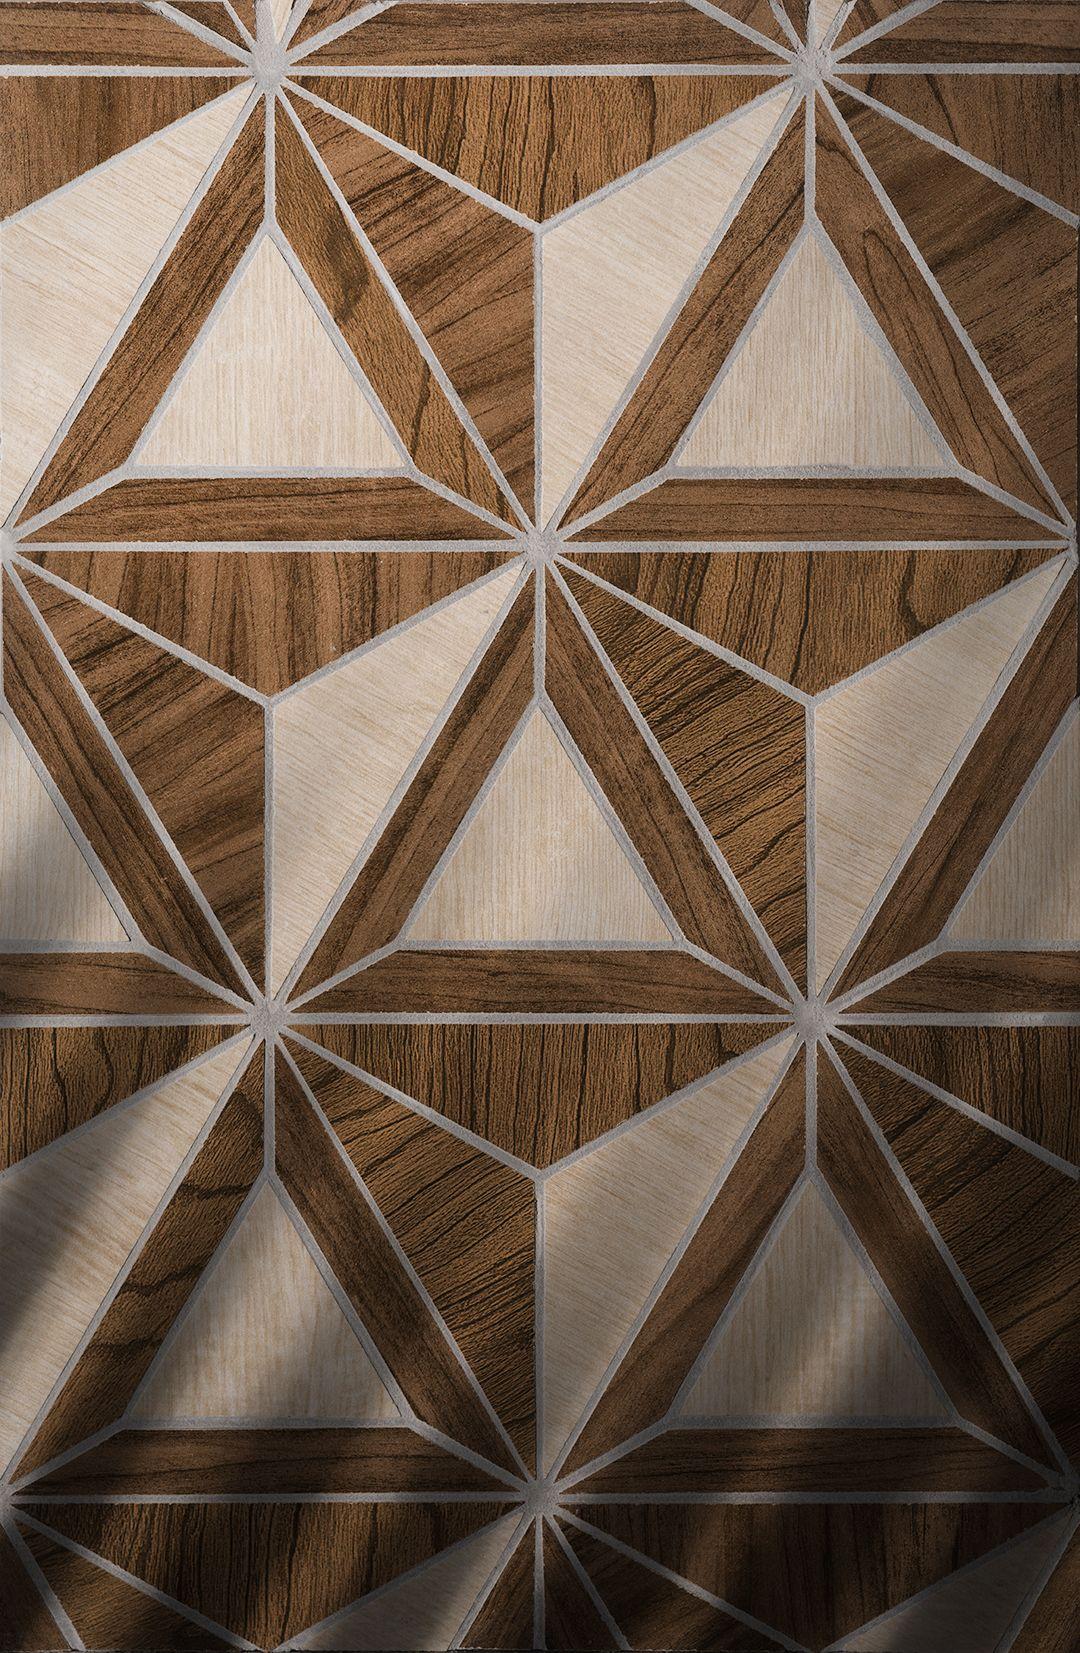 Golotri Geometric Shapes Shown In Wood Porcelain Waterjet